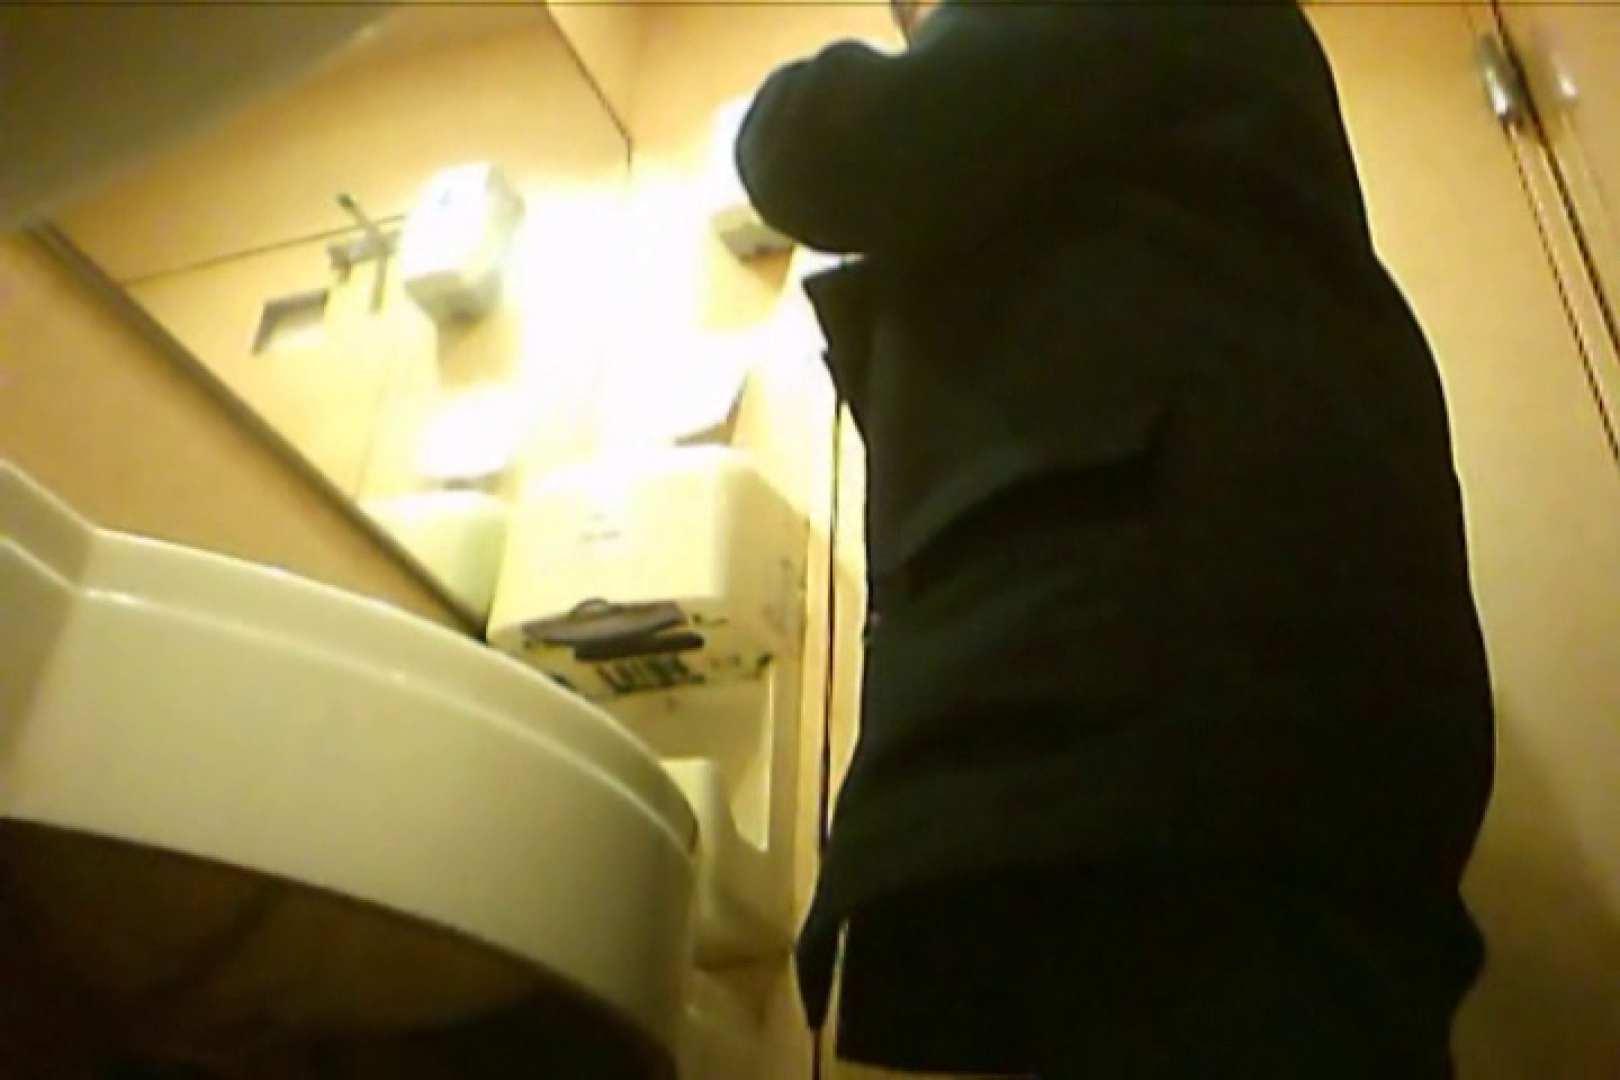 Gボーイ初投稿!掴み取りさんの洗面所覗き!in新幹線!VOL.17 スーツ ゲイアダルトビデオ画像 88連発 8